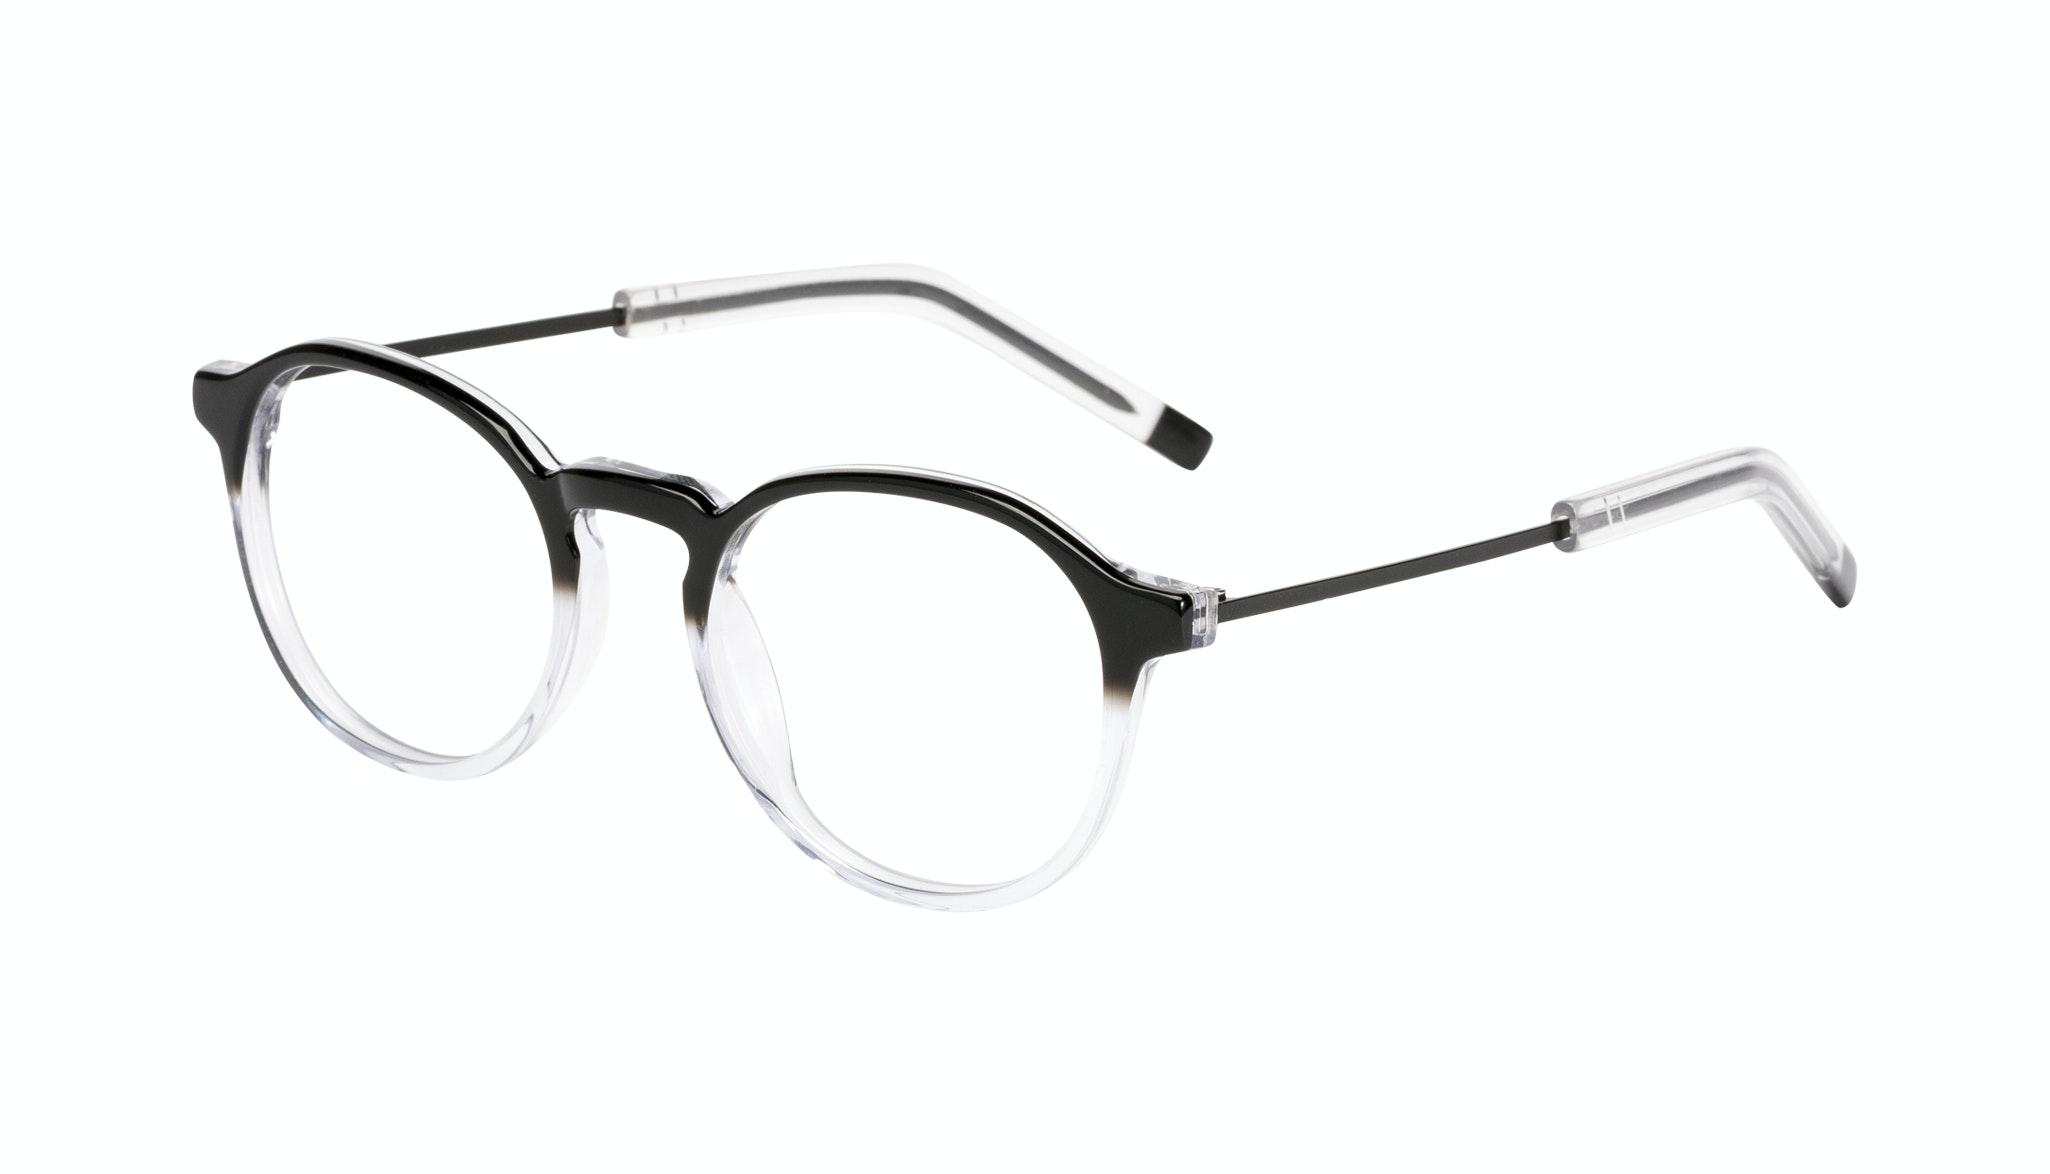 Affordable Fashion Glasses Round Eyeglasses Men Prime Onyx Clear Tilt